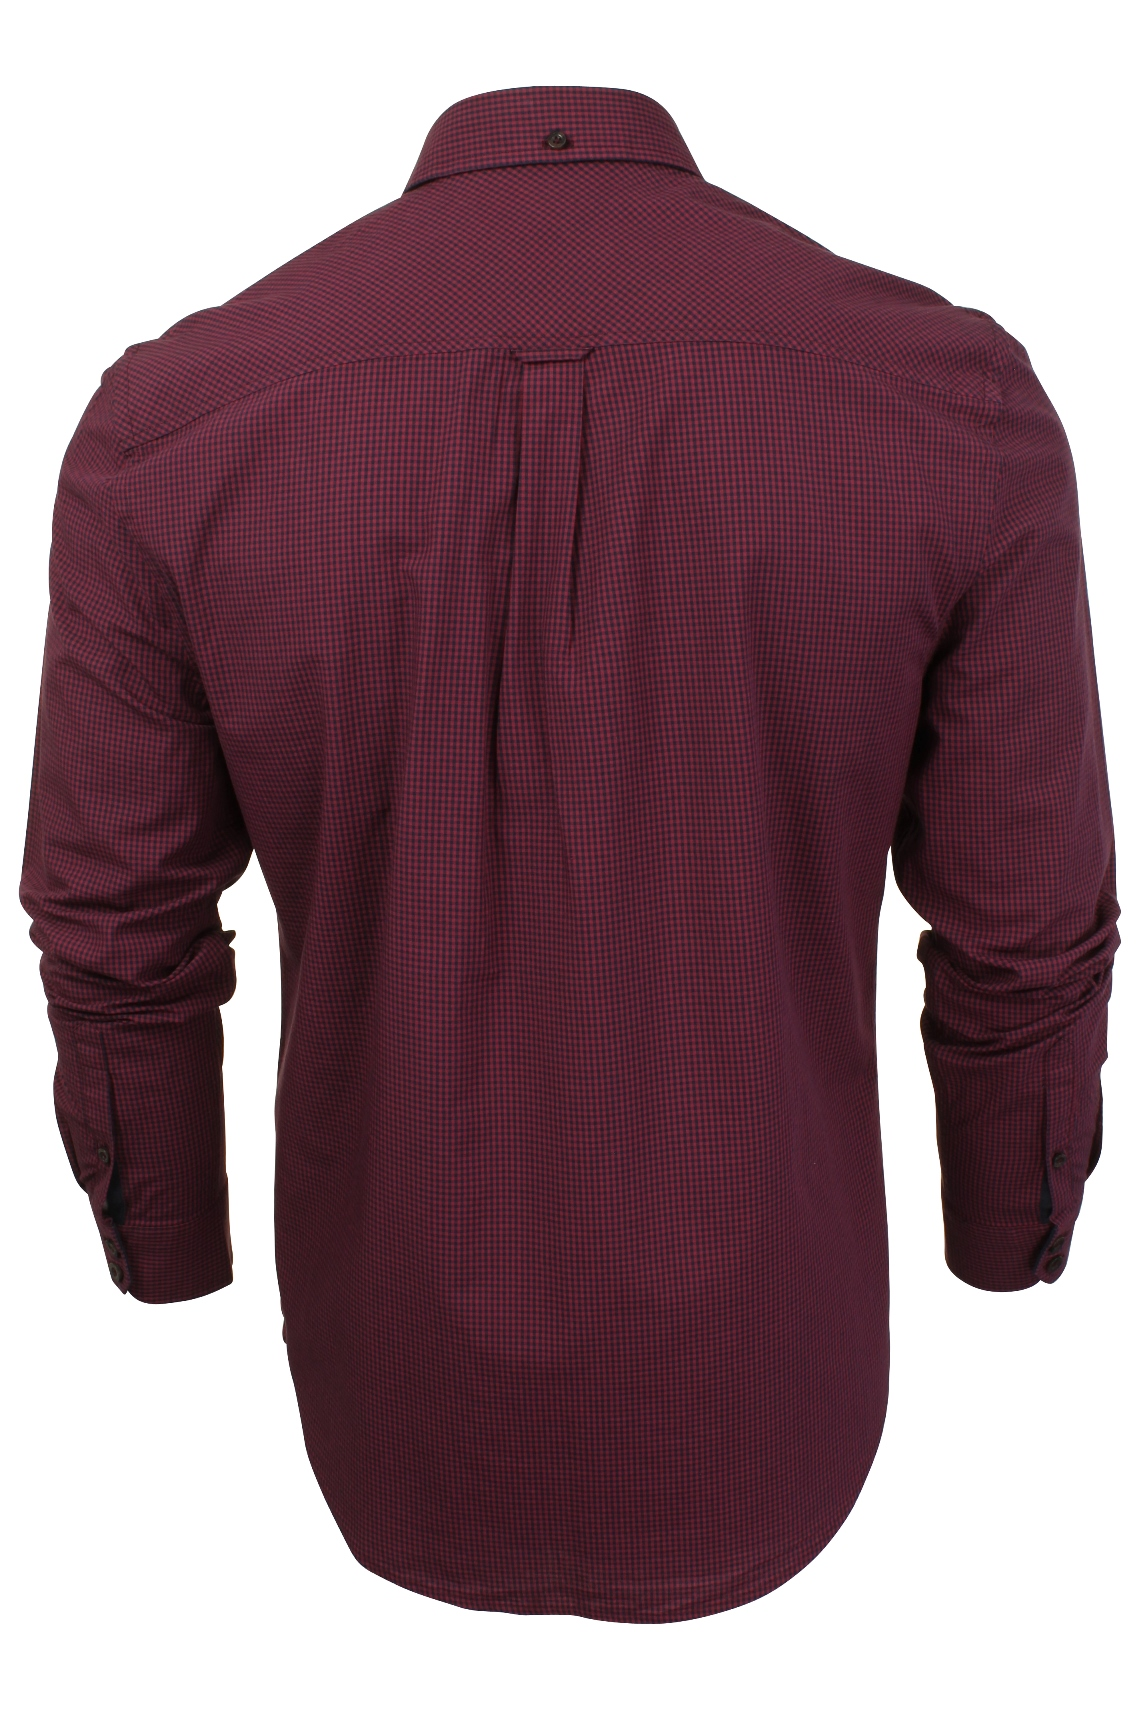 Mens-Classic-Gingham-Shirt-by-Ben-Sherman-Long-Sleeved thumbnail 14